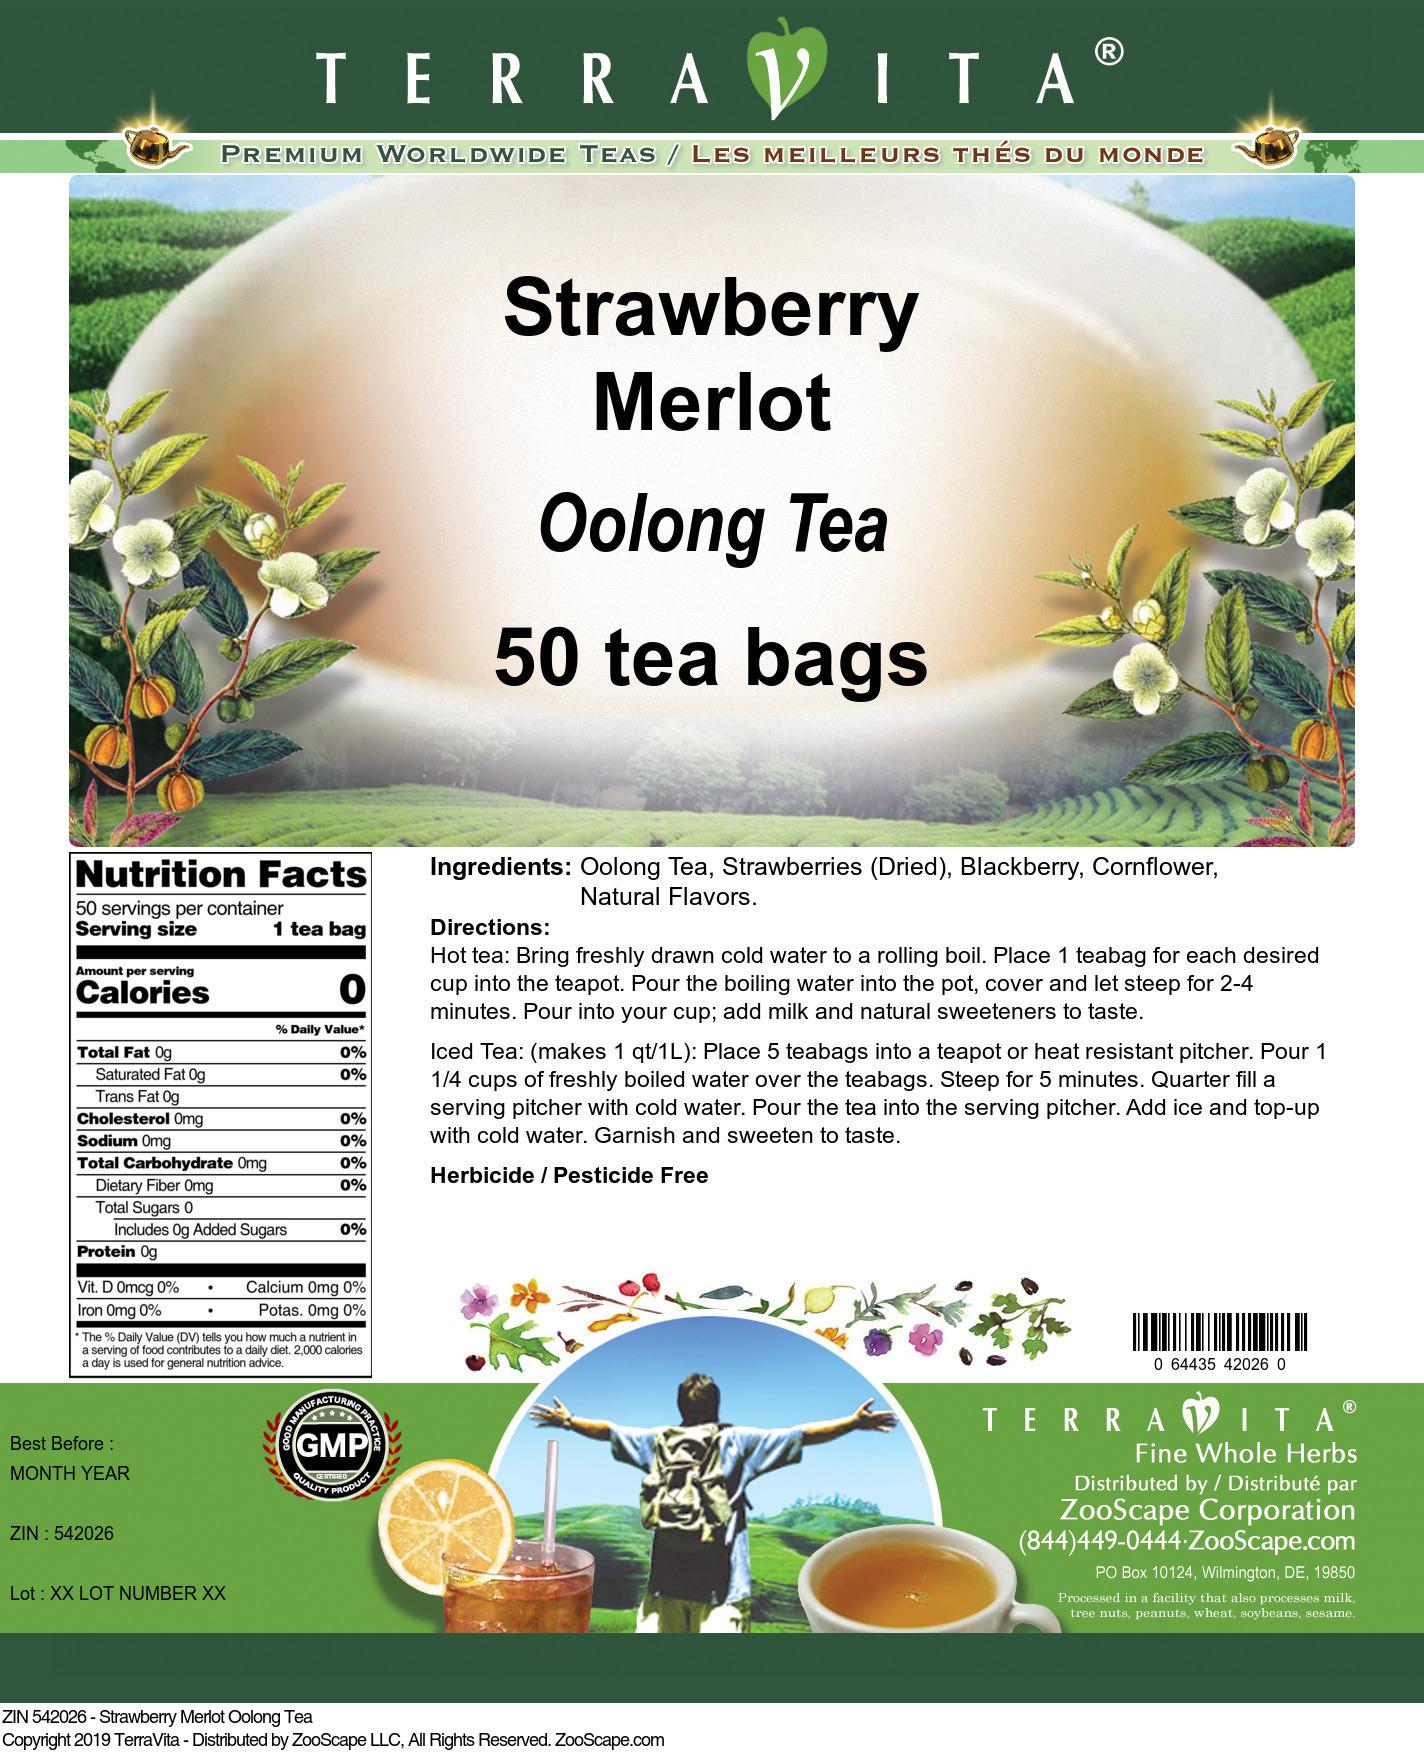 Strawberry Merlot Oolong Tea